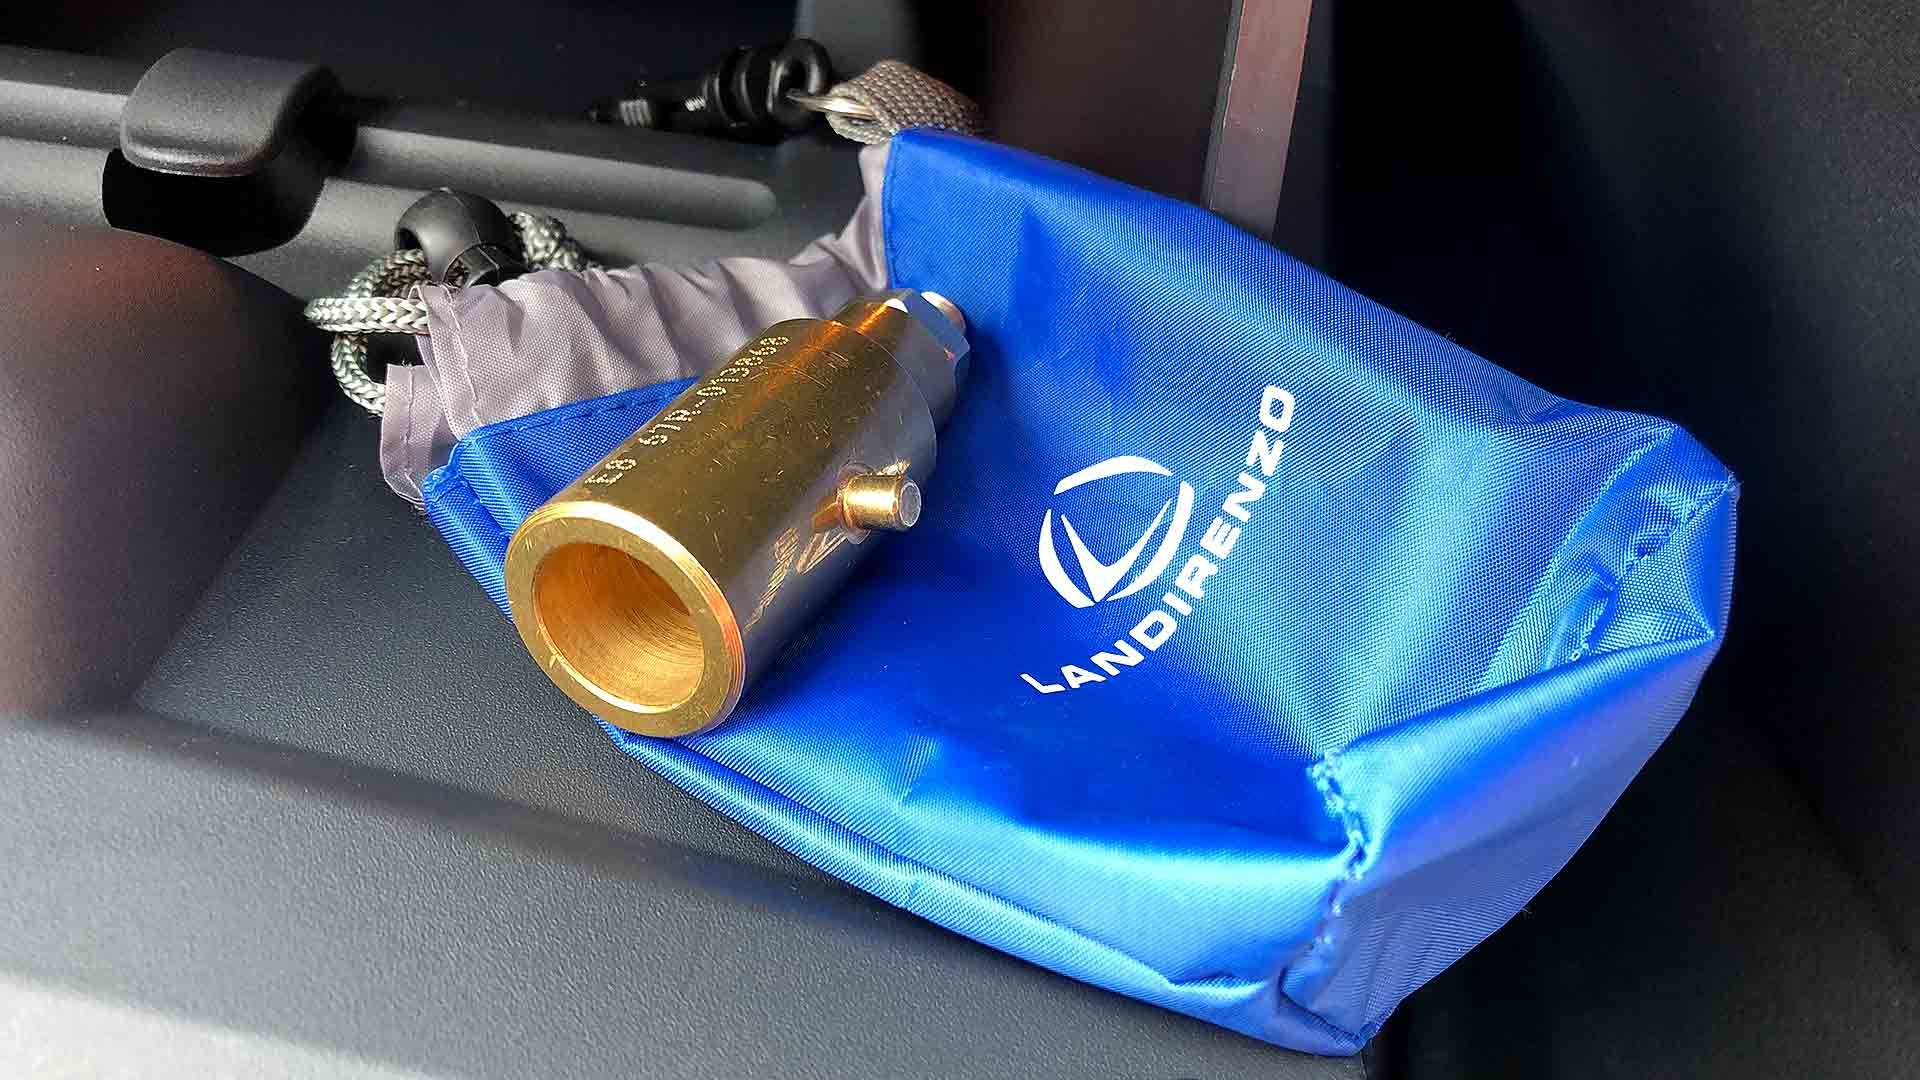 Dacia Sandero Steway Bi-Fuel